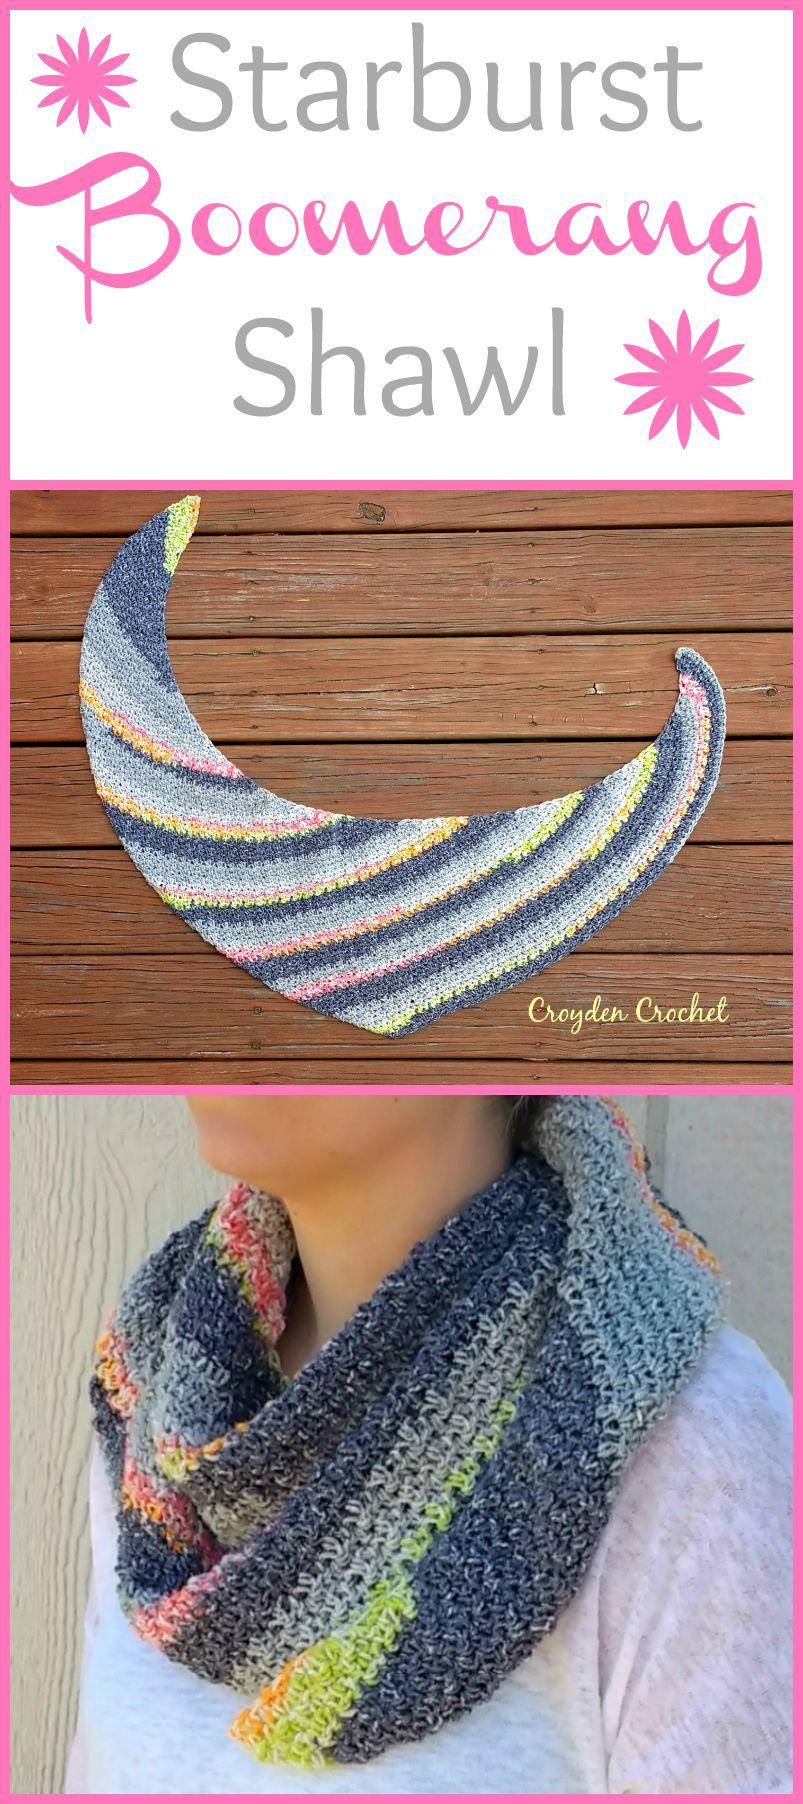 Crochet starburst boomerang shawl free crochet shawl patterns crochet starburst boomerang shawl free crochet shawl patternscrochet bankloansurffo Images